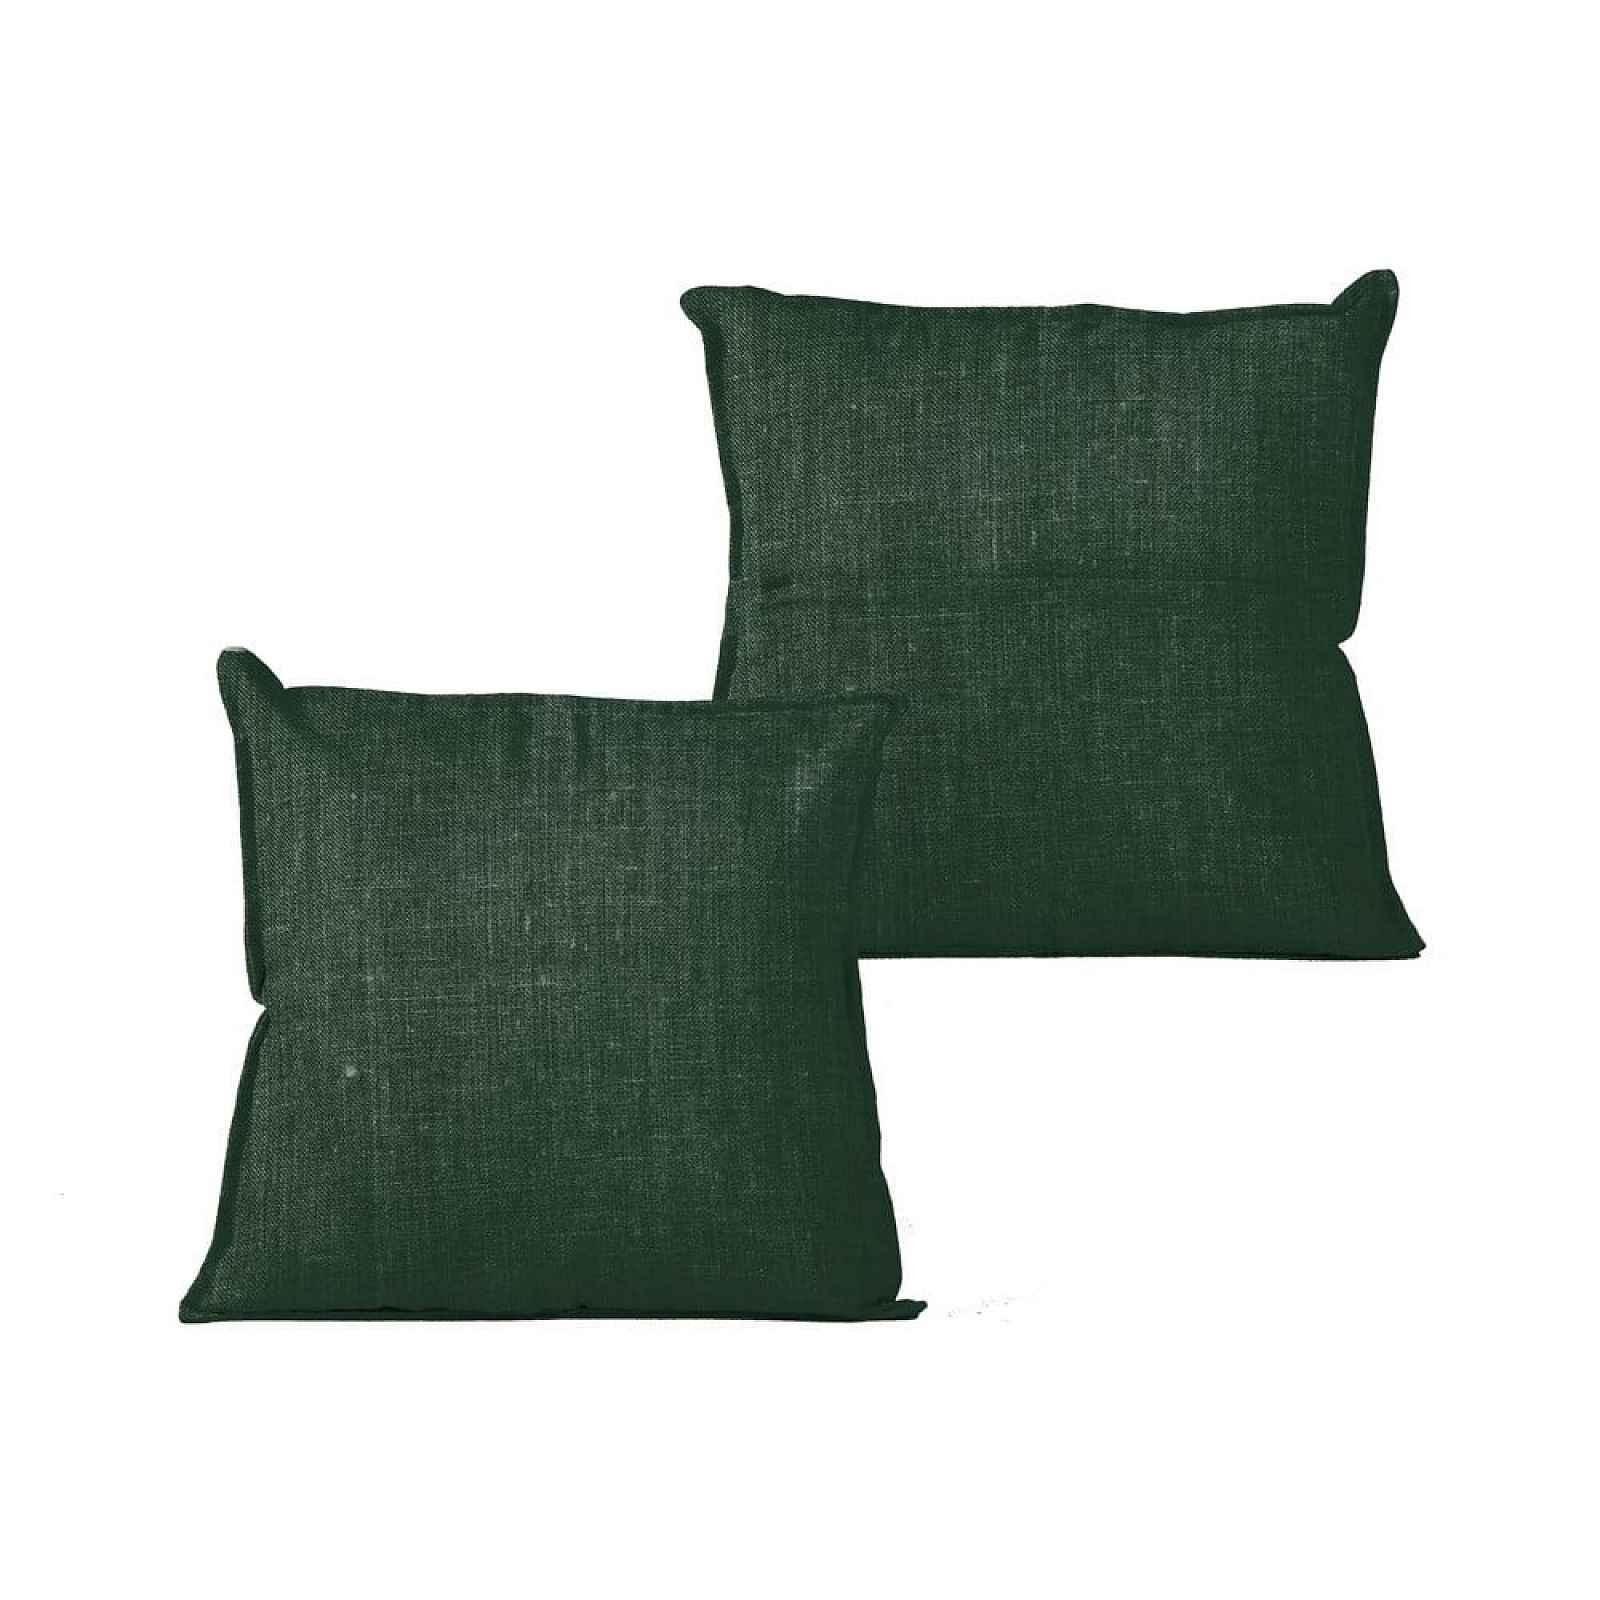 Zelený polštář Linen Couture Moss,45x45cm